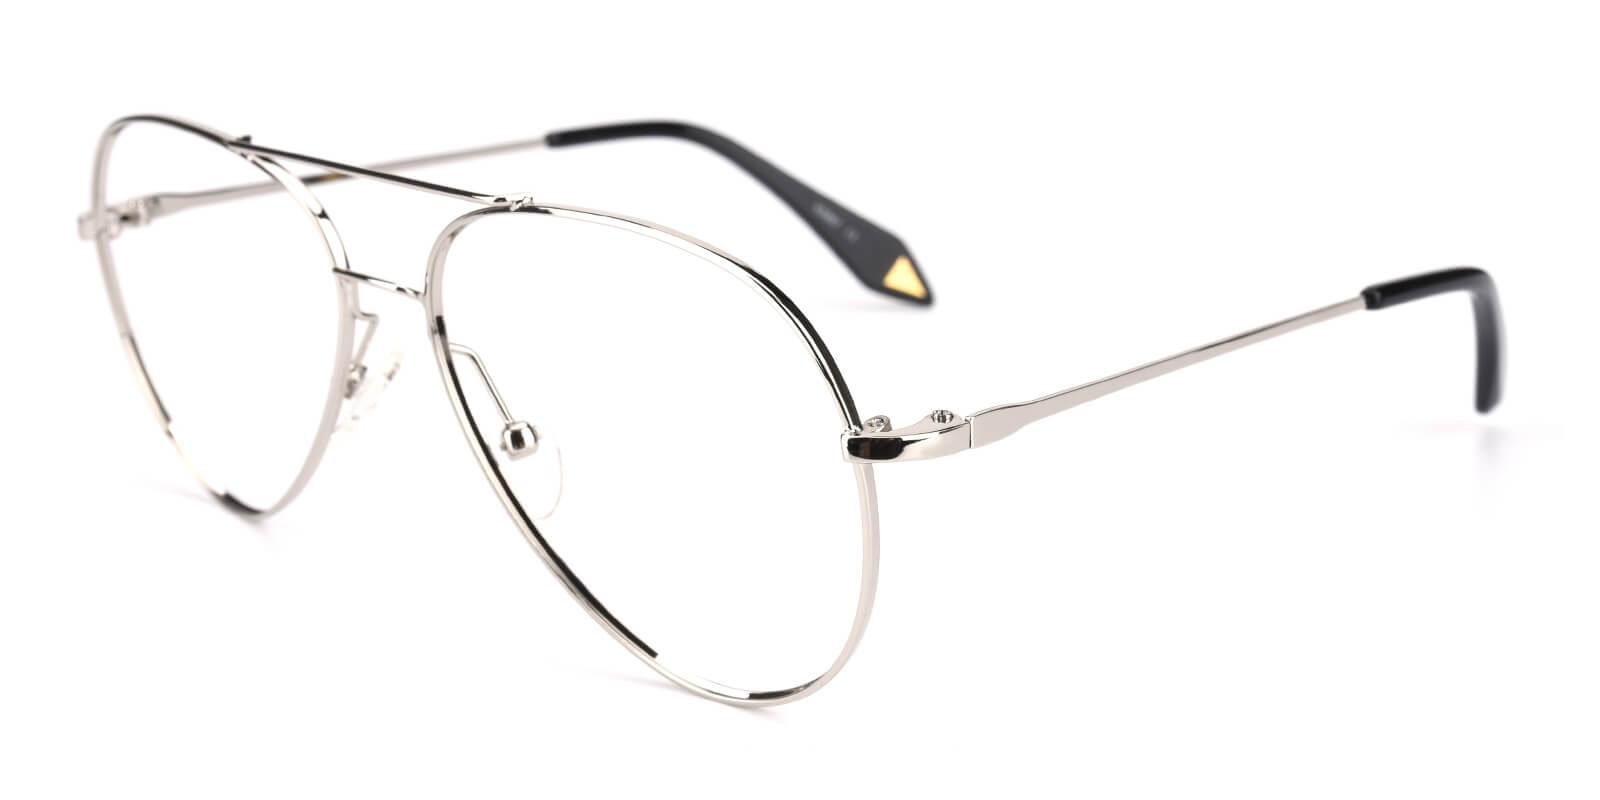 Pilot-Silver-Aviator-Metal-Eyeglasses-detail